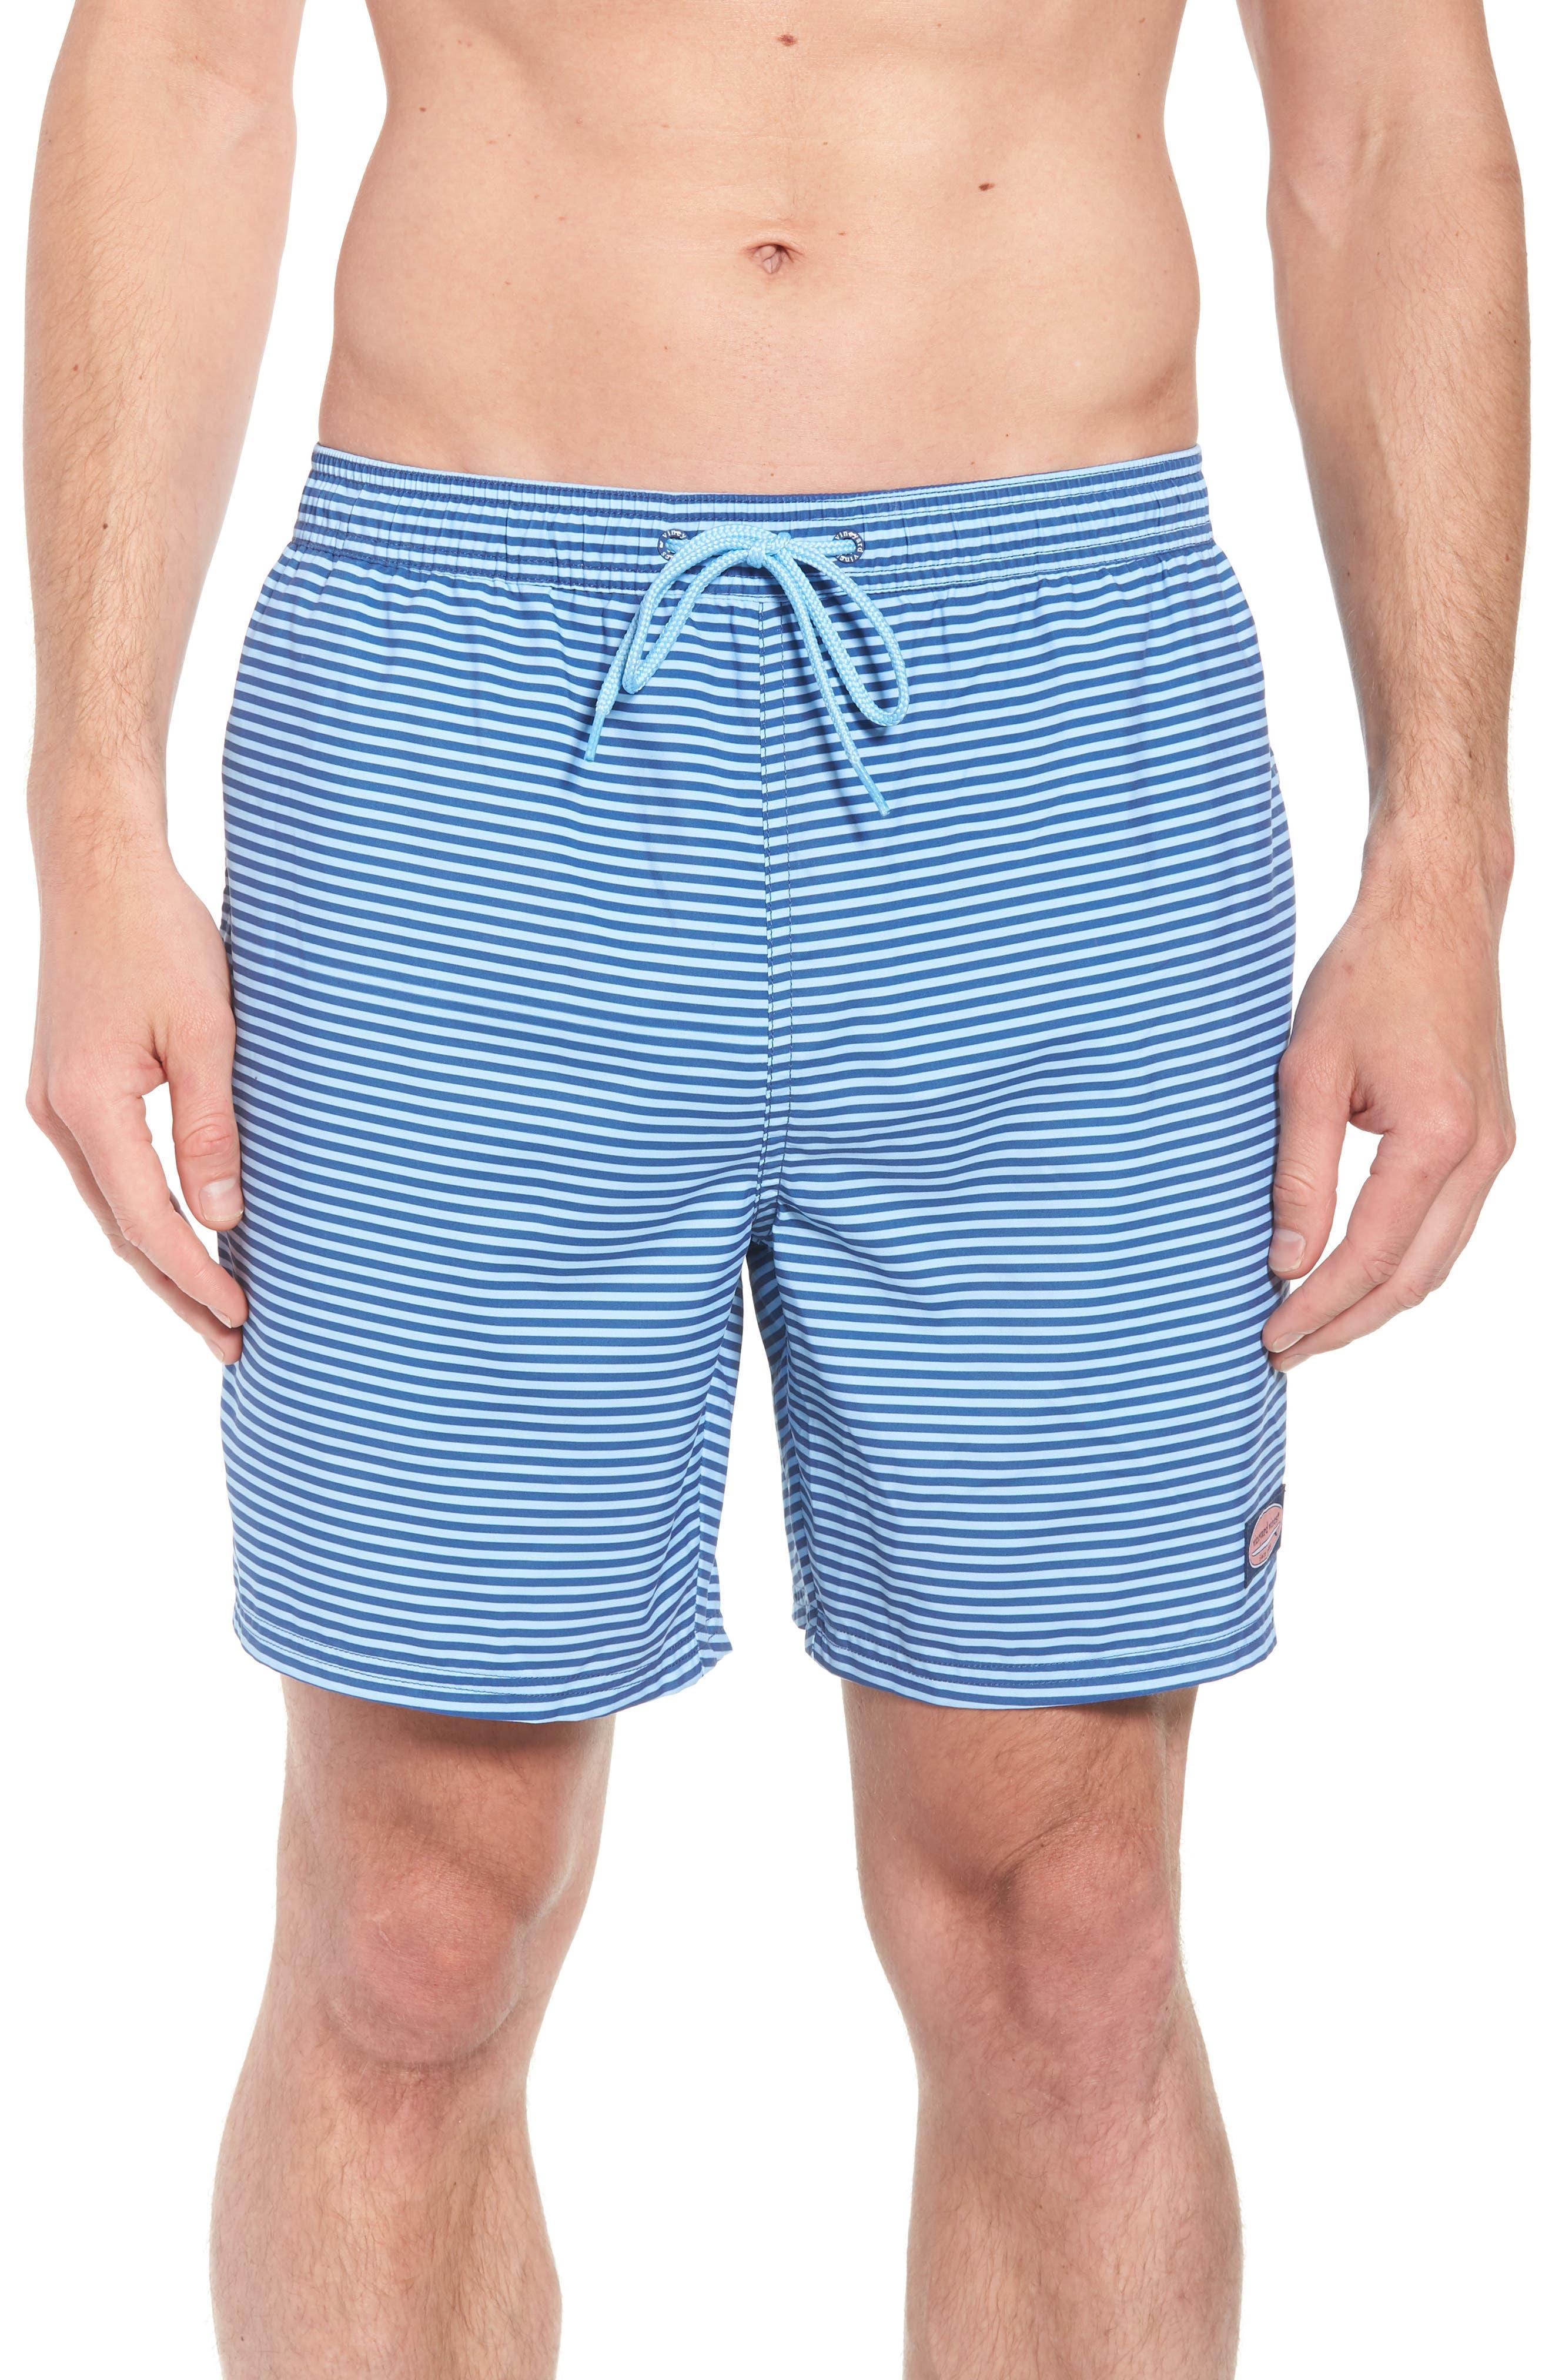 Chappy Stiles Point Swim Trunks,                         Main,                         color, 461